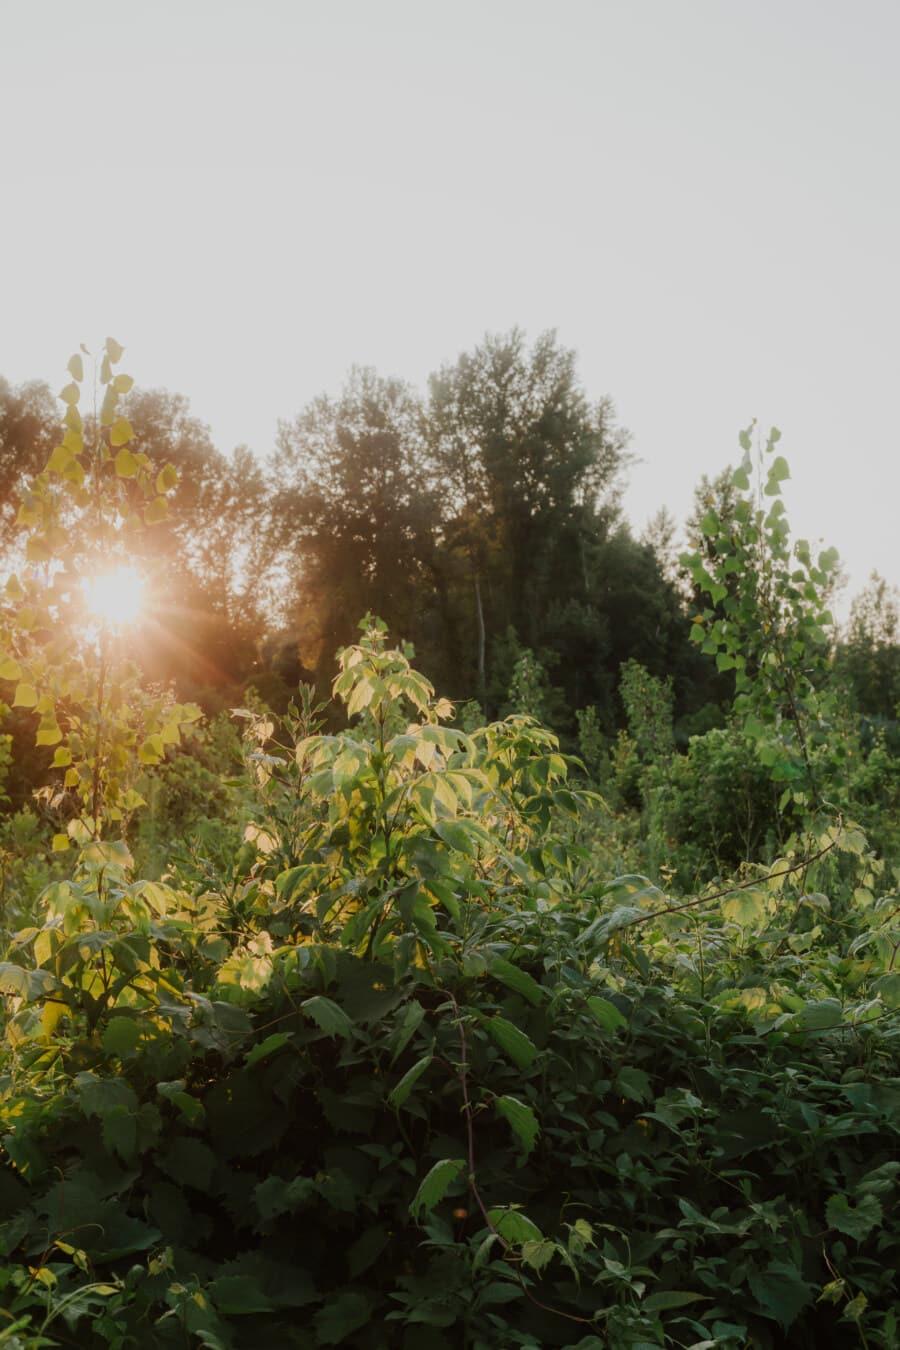 sunrays, sunshine, sunny, forest, bushes, branches, greenery, plant, landscape, leaf